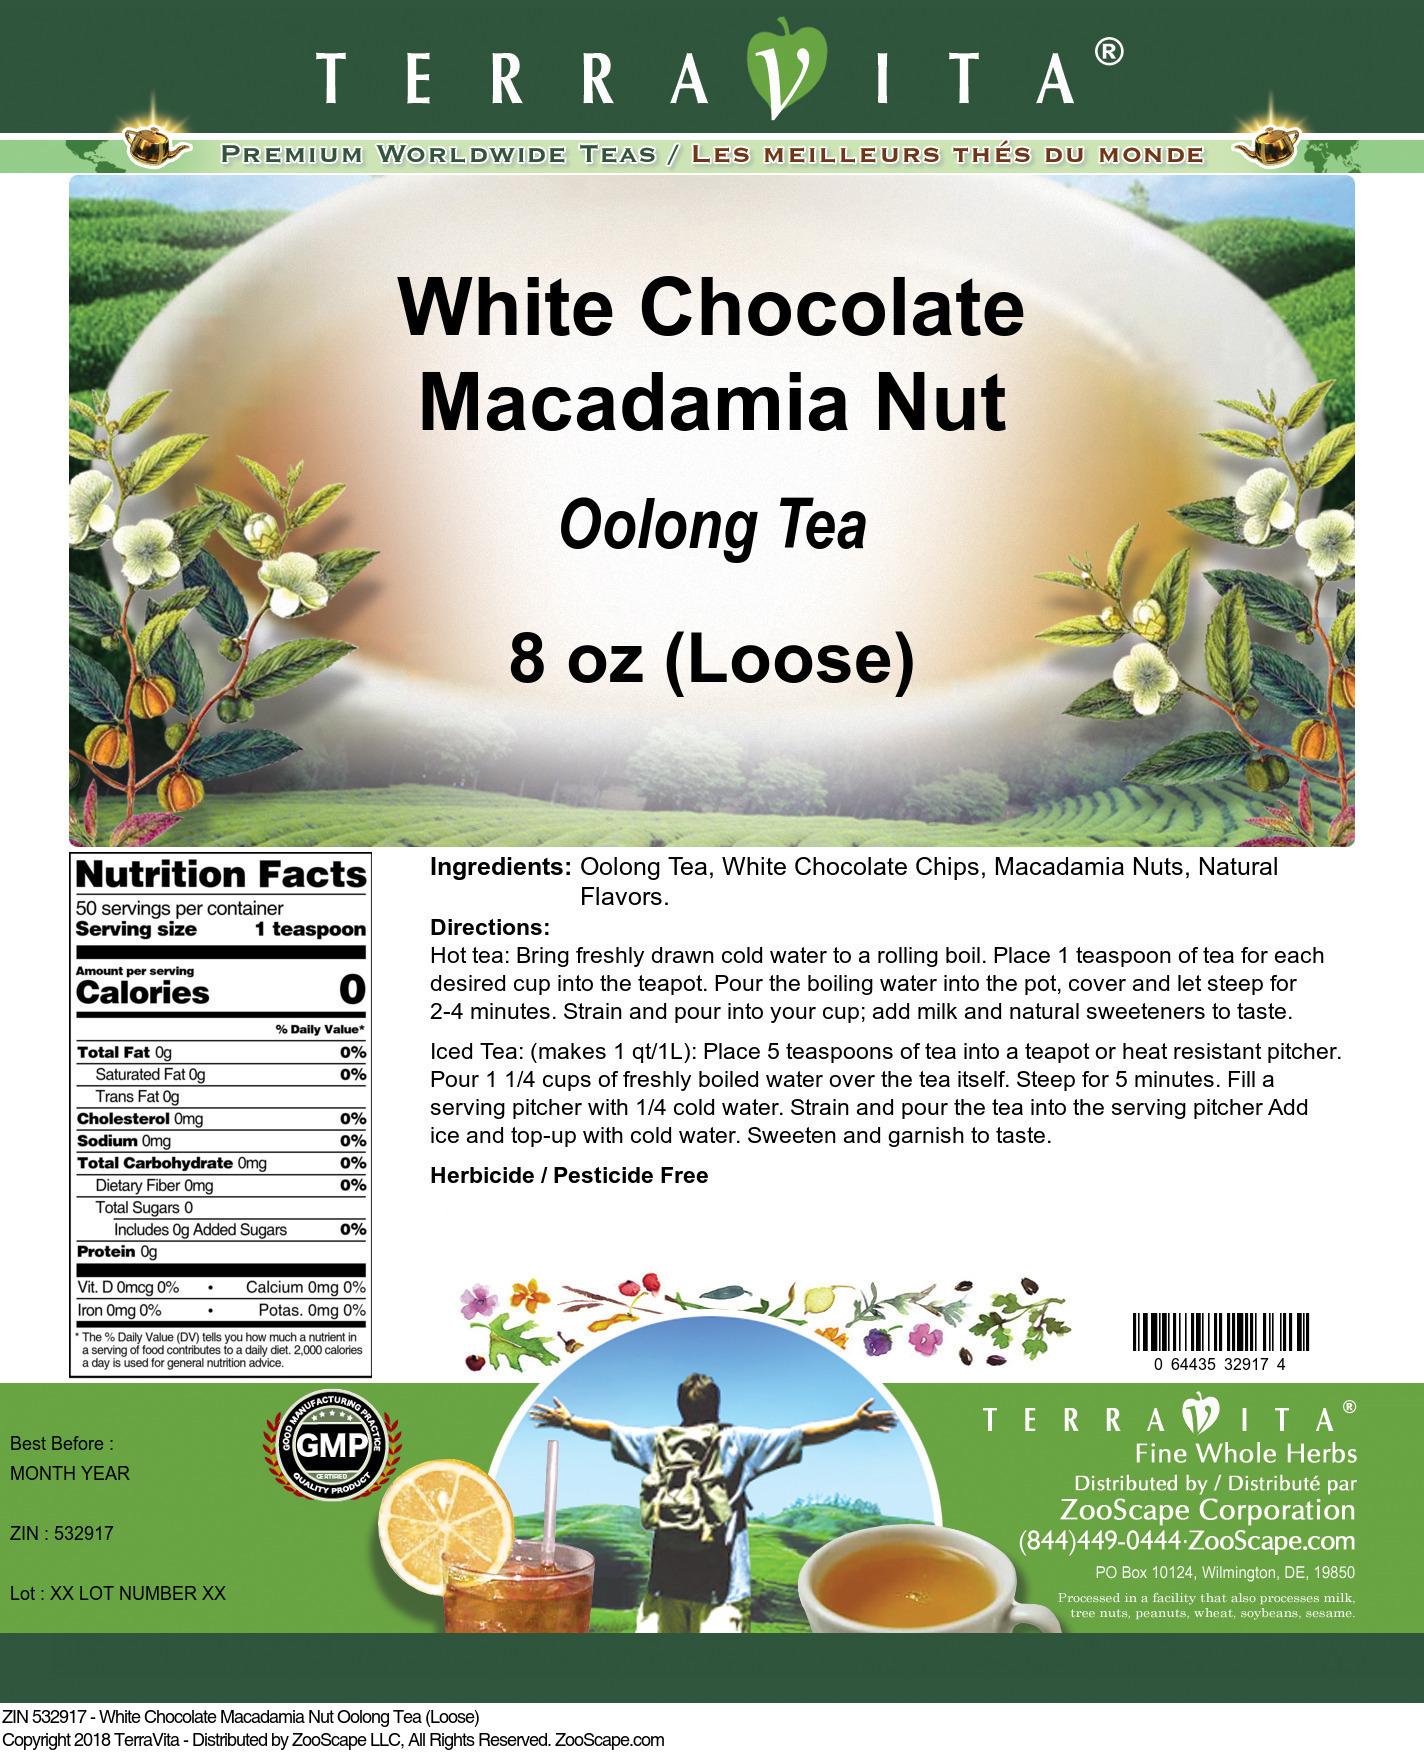 White Chocolate Macadamia Nut Oolong Tea (Loose)